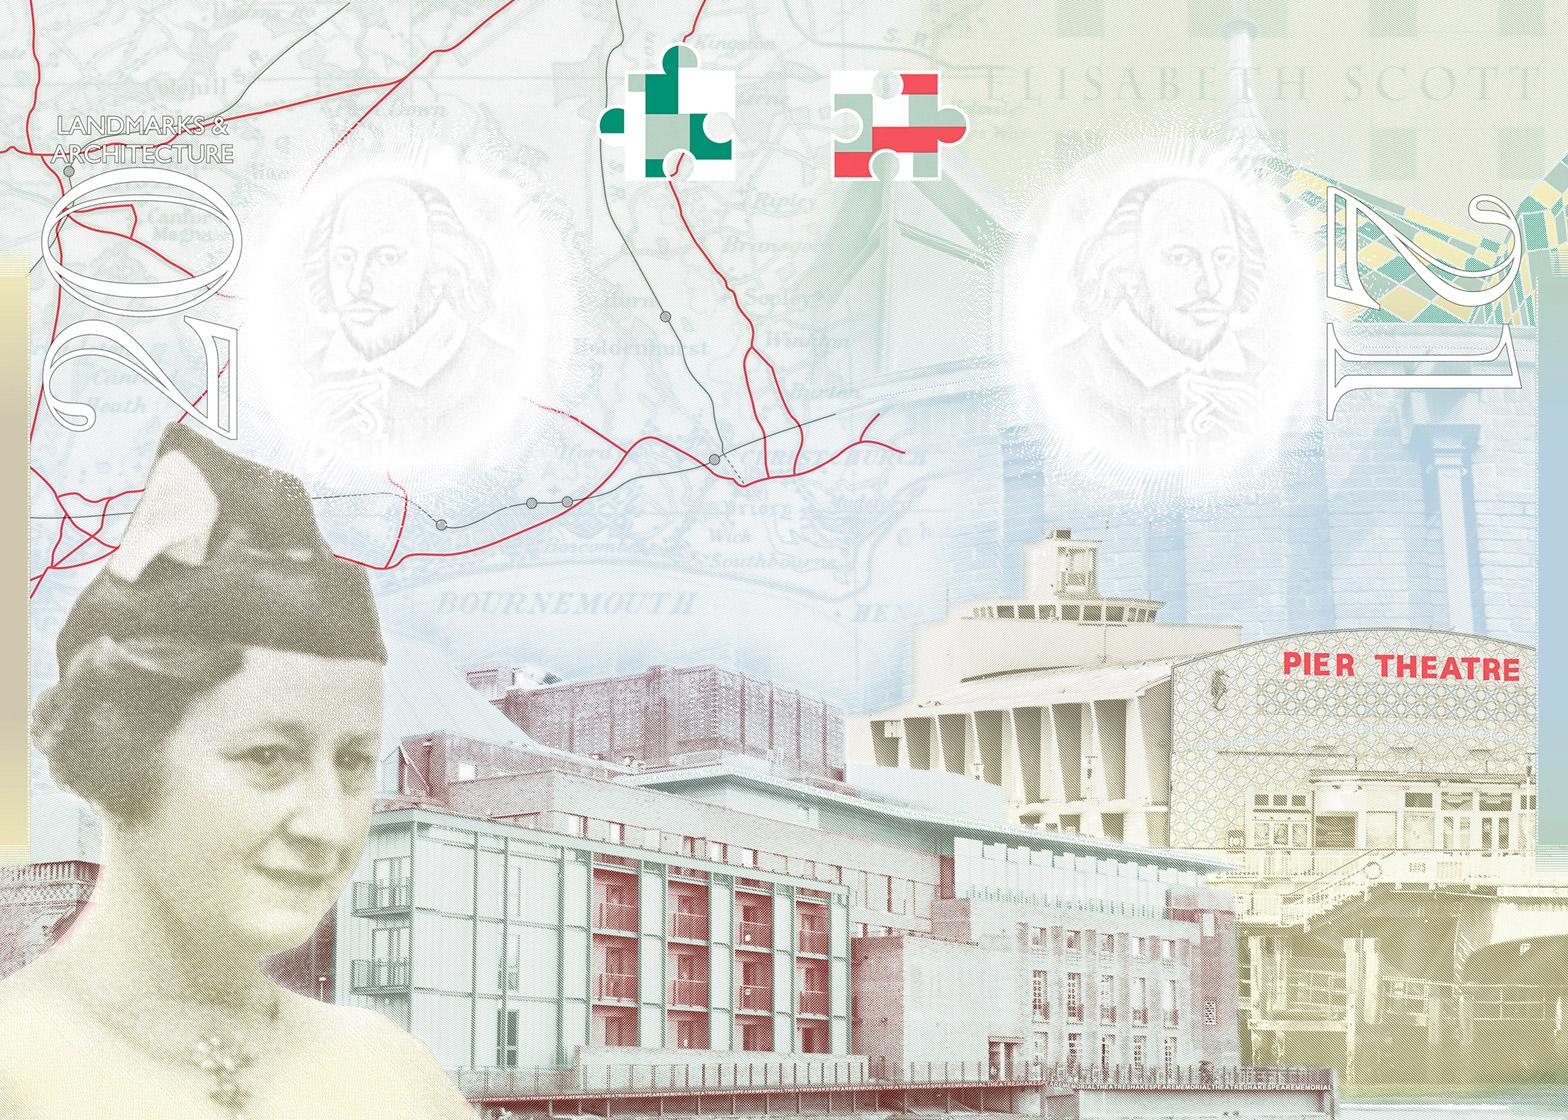 Updated British passport design